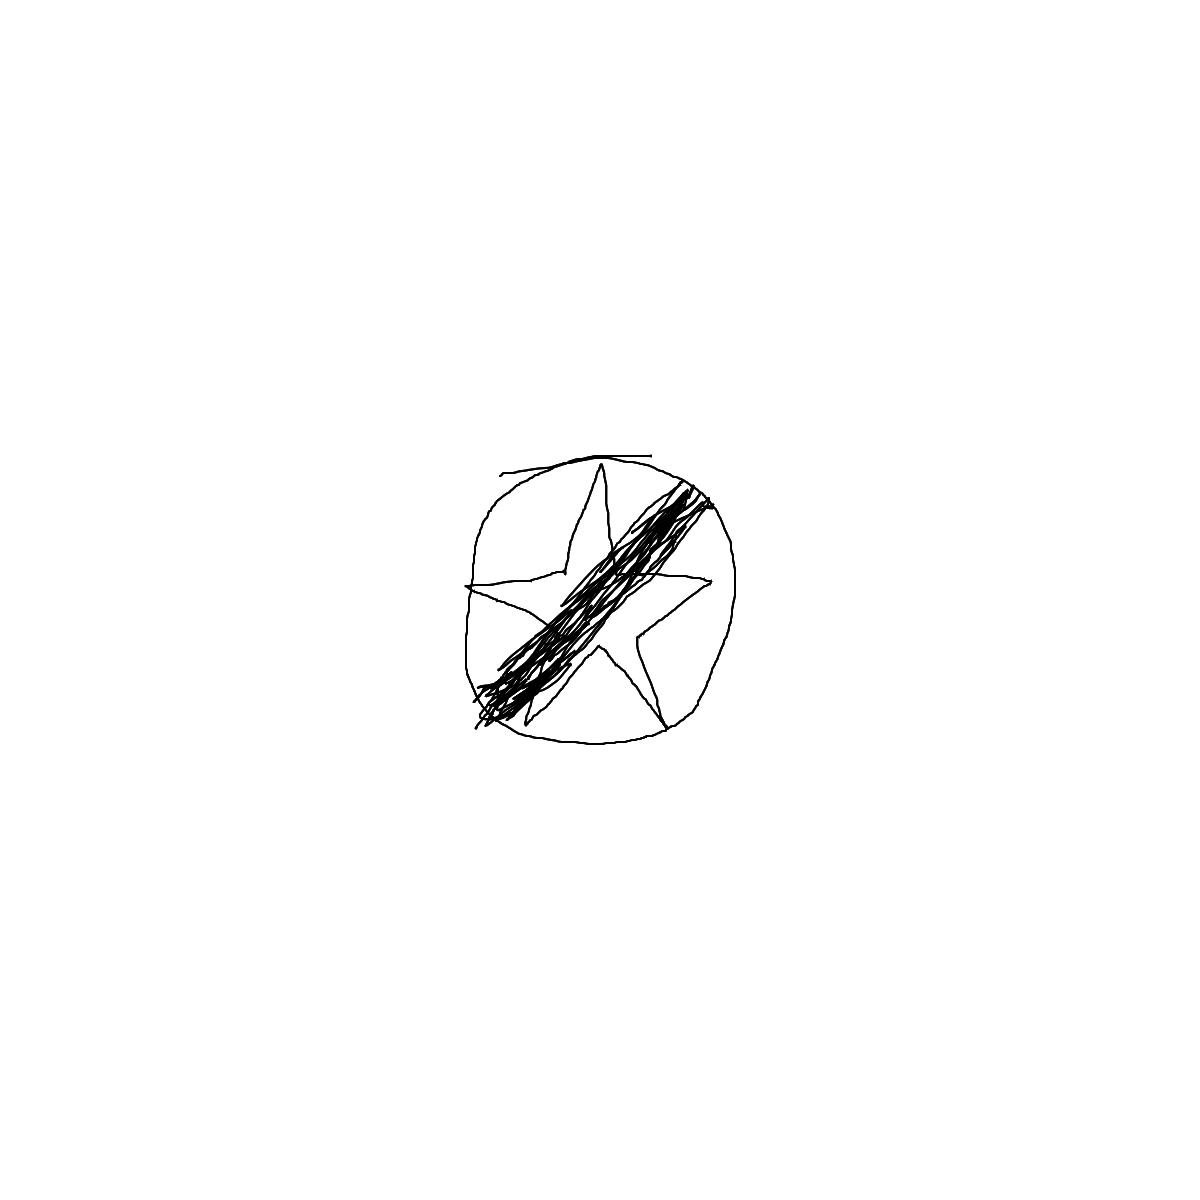 BAAAM drawing#1609 lat:52.4607238769531250lng: 16.9239349365234380